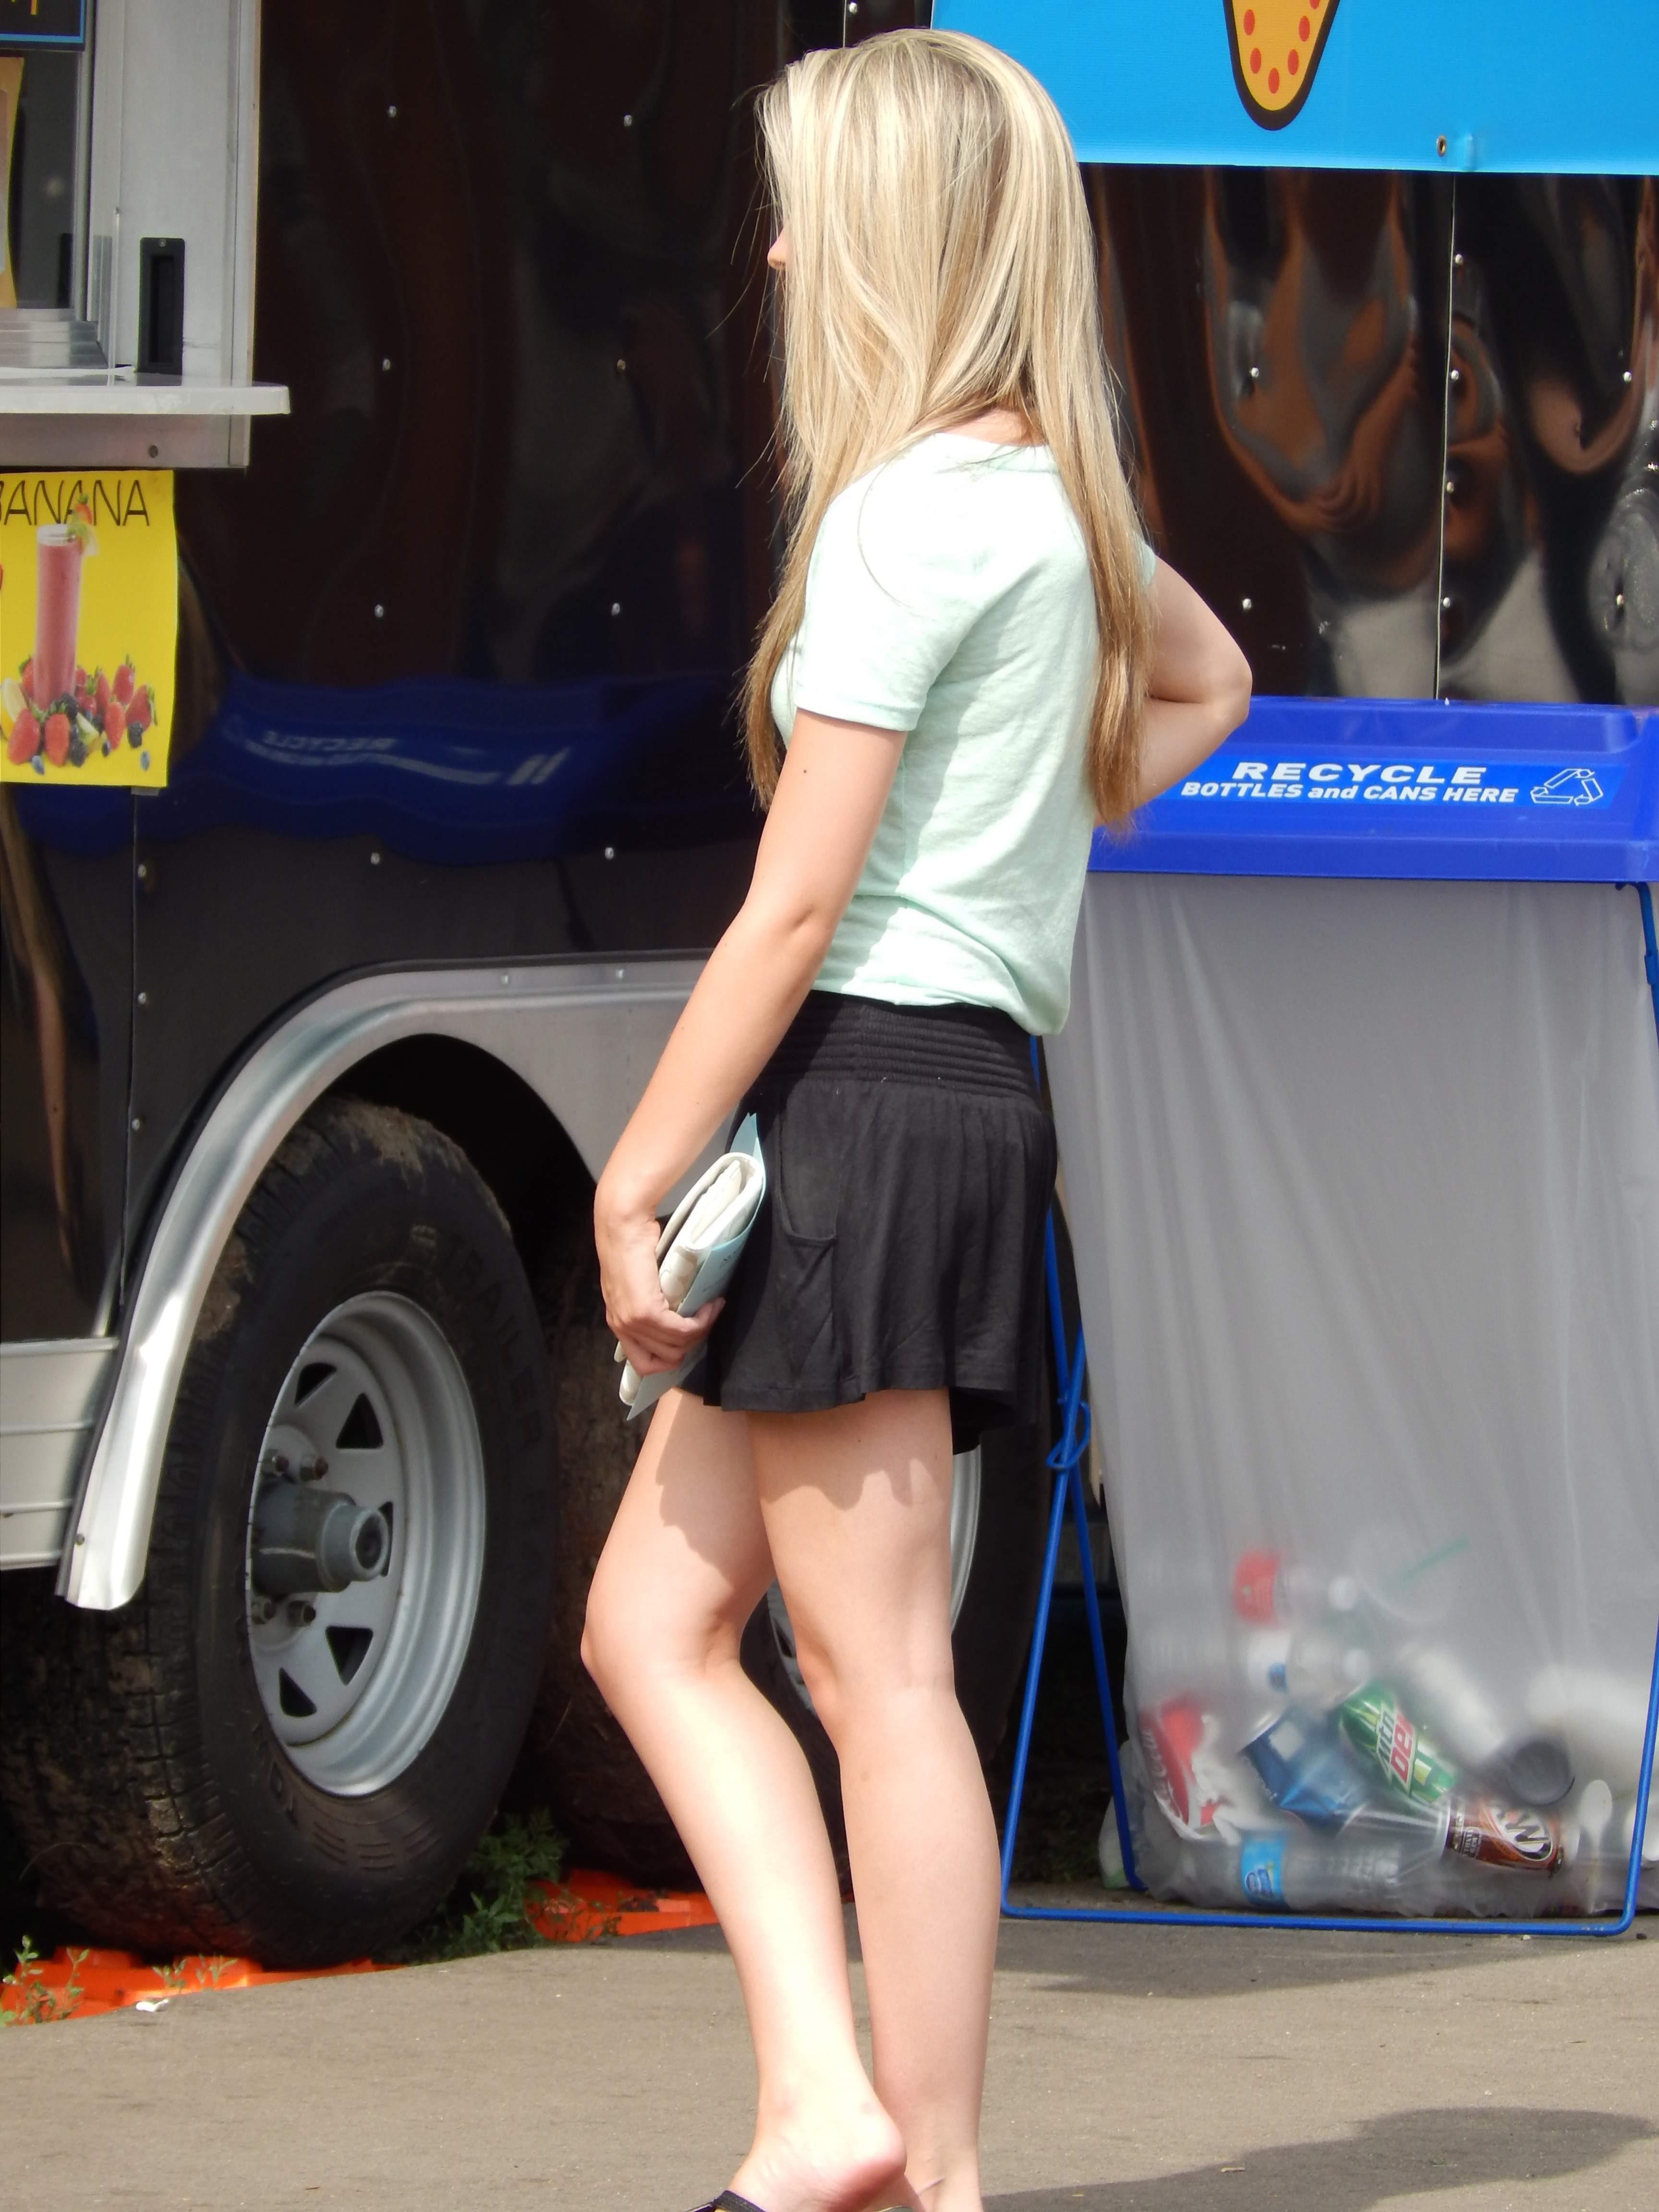 Sexy Street CANDIDS! - Gallery   eBaums World